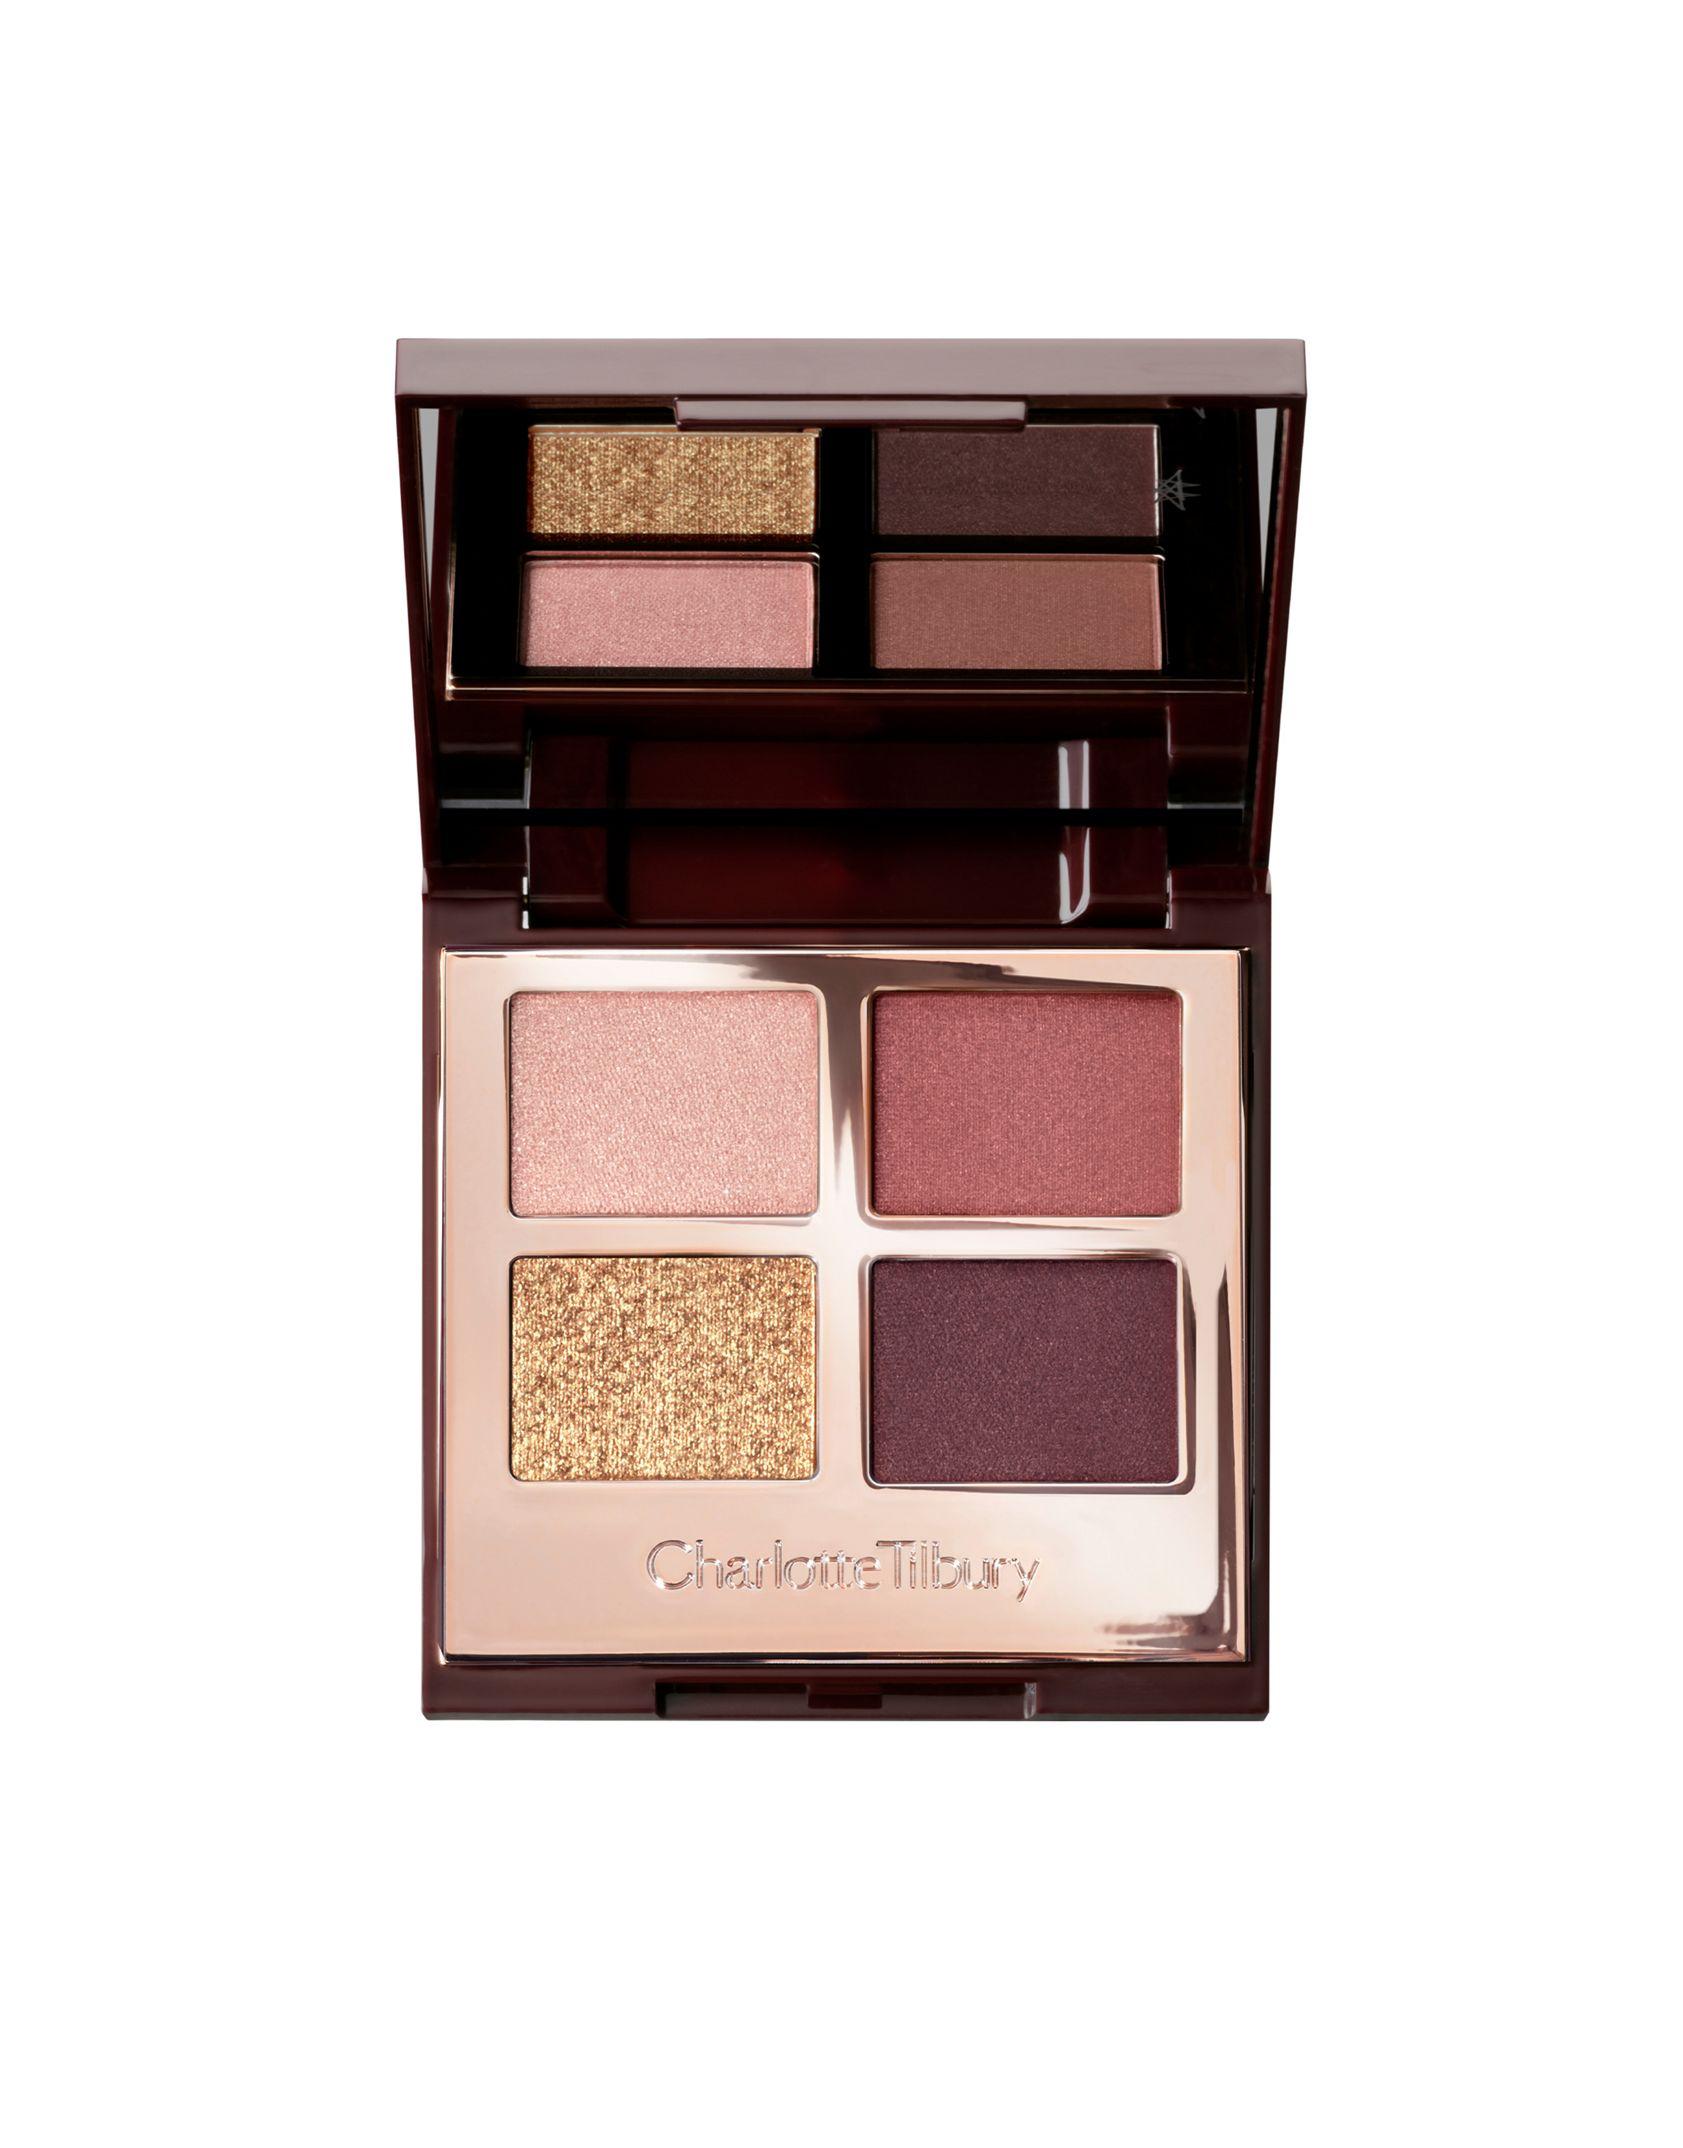 Charlotte Tilbury Luxury Palette - Vintage Vamp - ASOS Price Checker